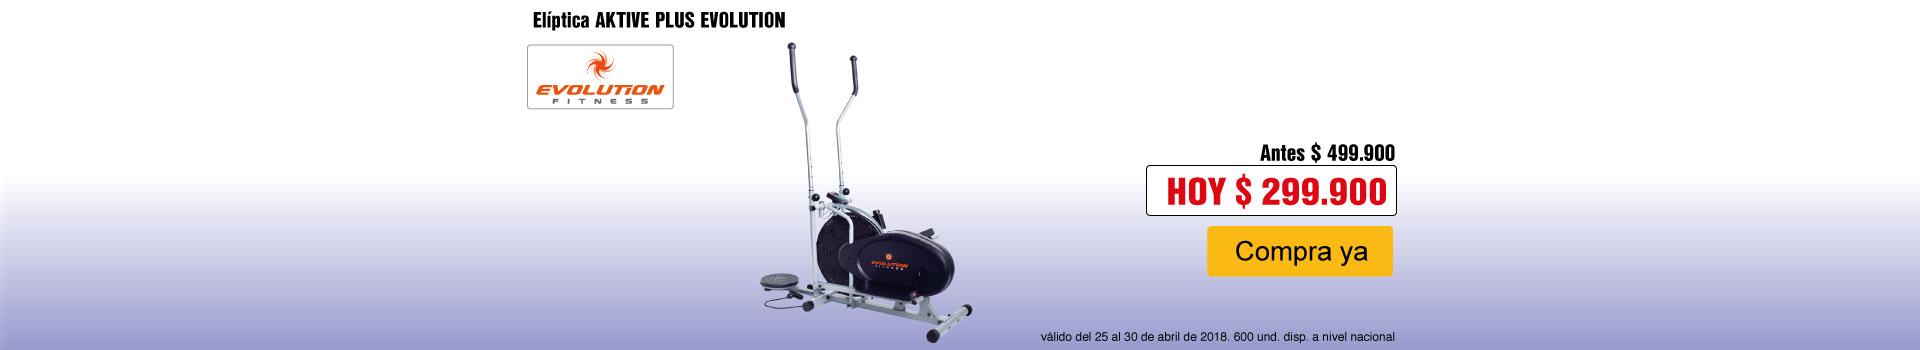 AK-BCAT-1-hogar-PP---Evolution-Aktive-plus-Abr25